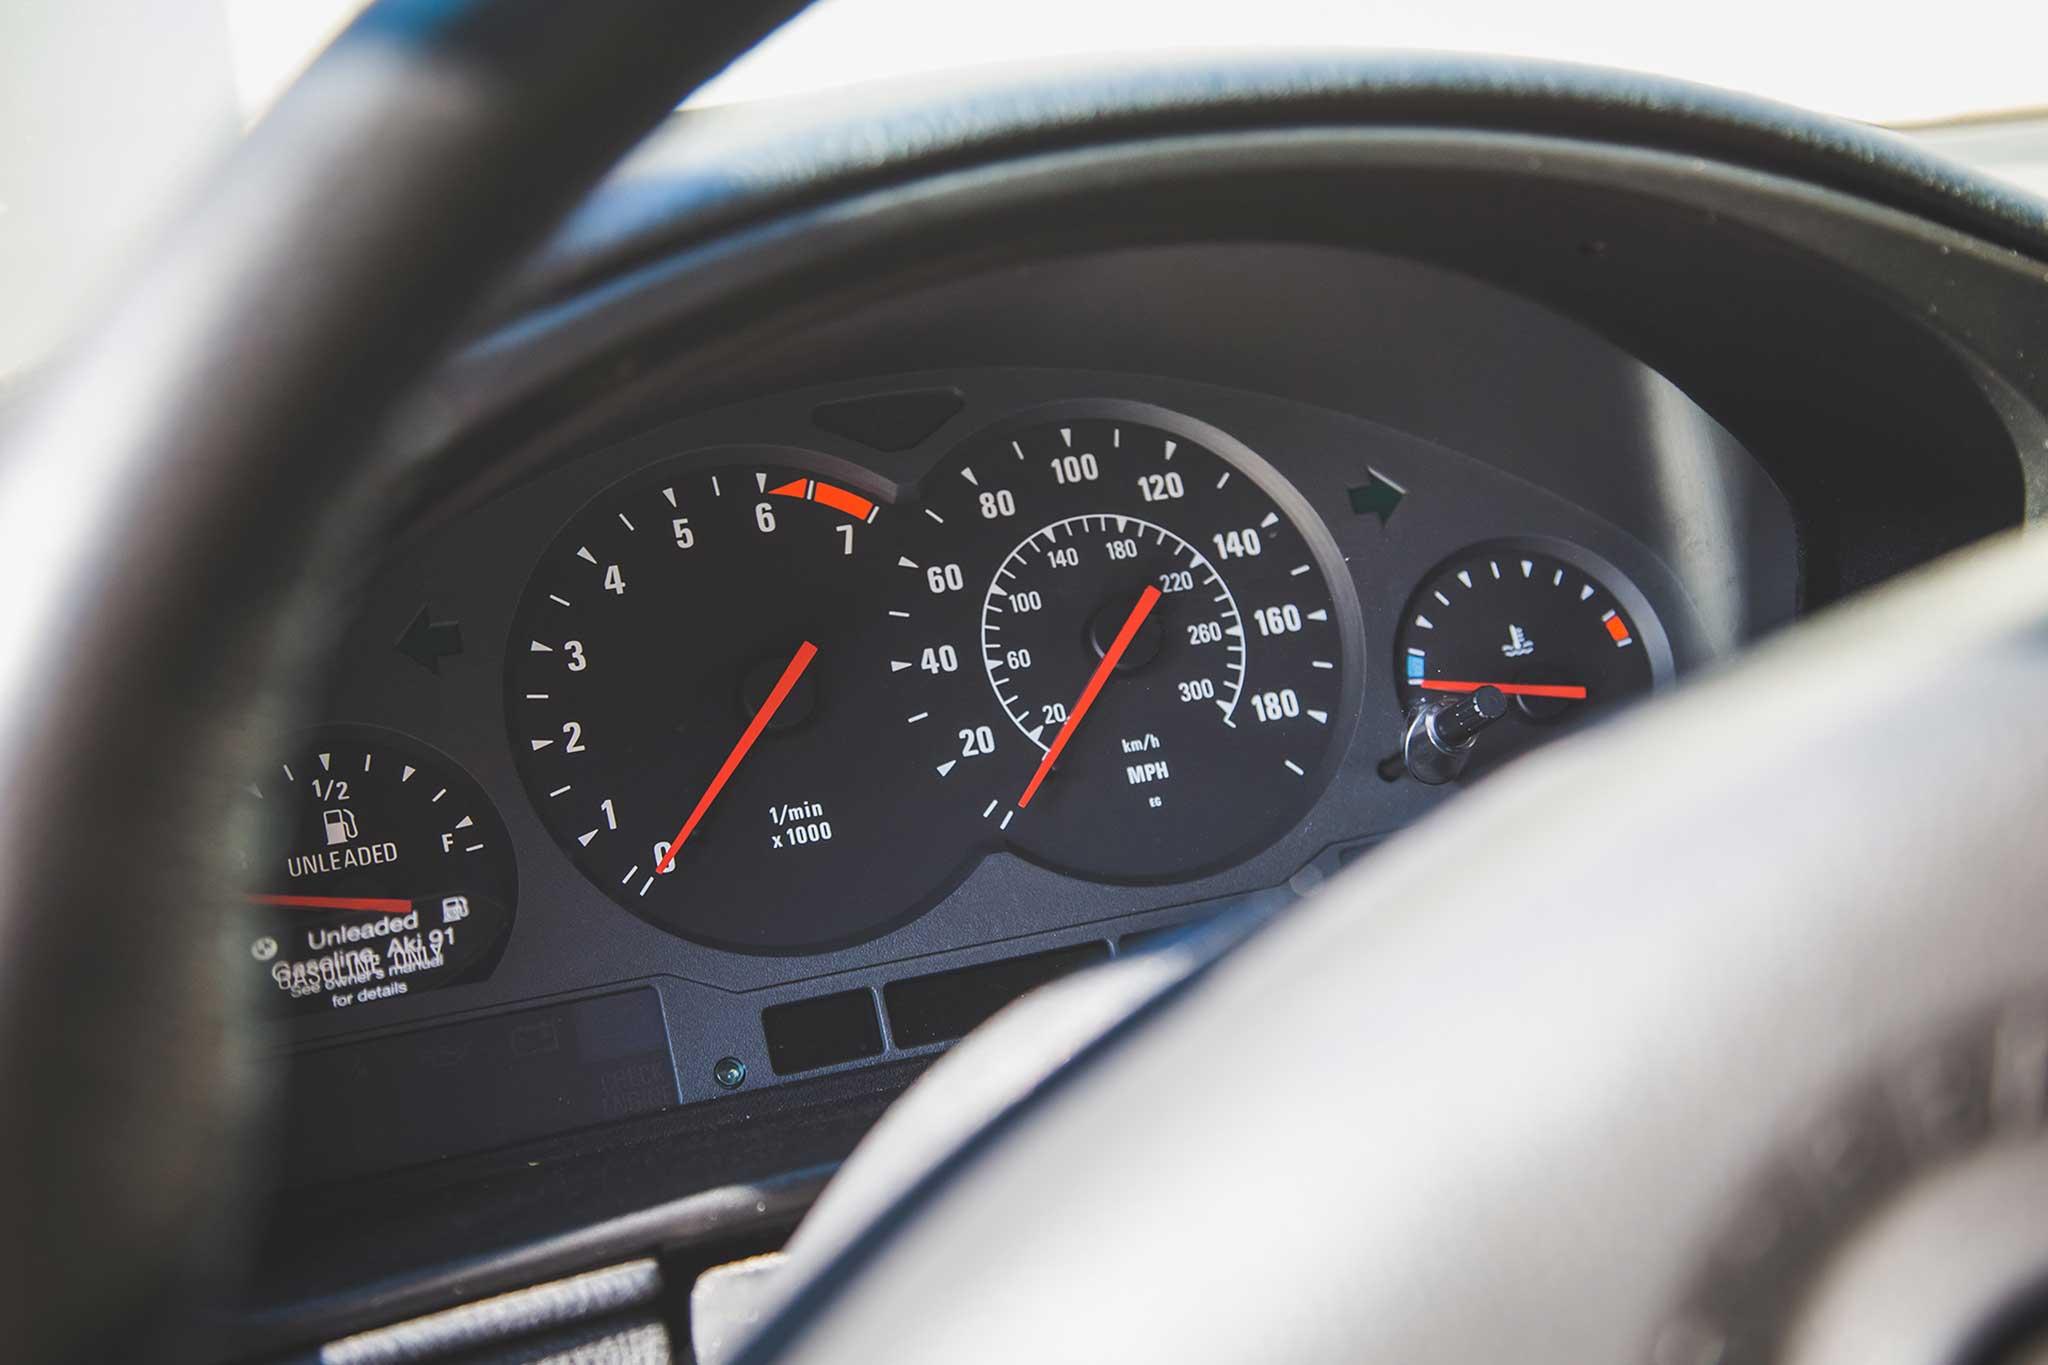 1994-BMW-850CSi-instrument-panel.jpg